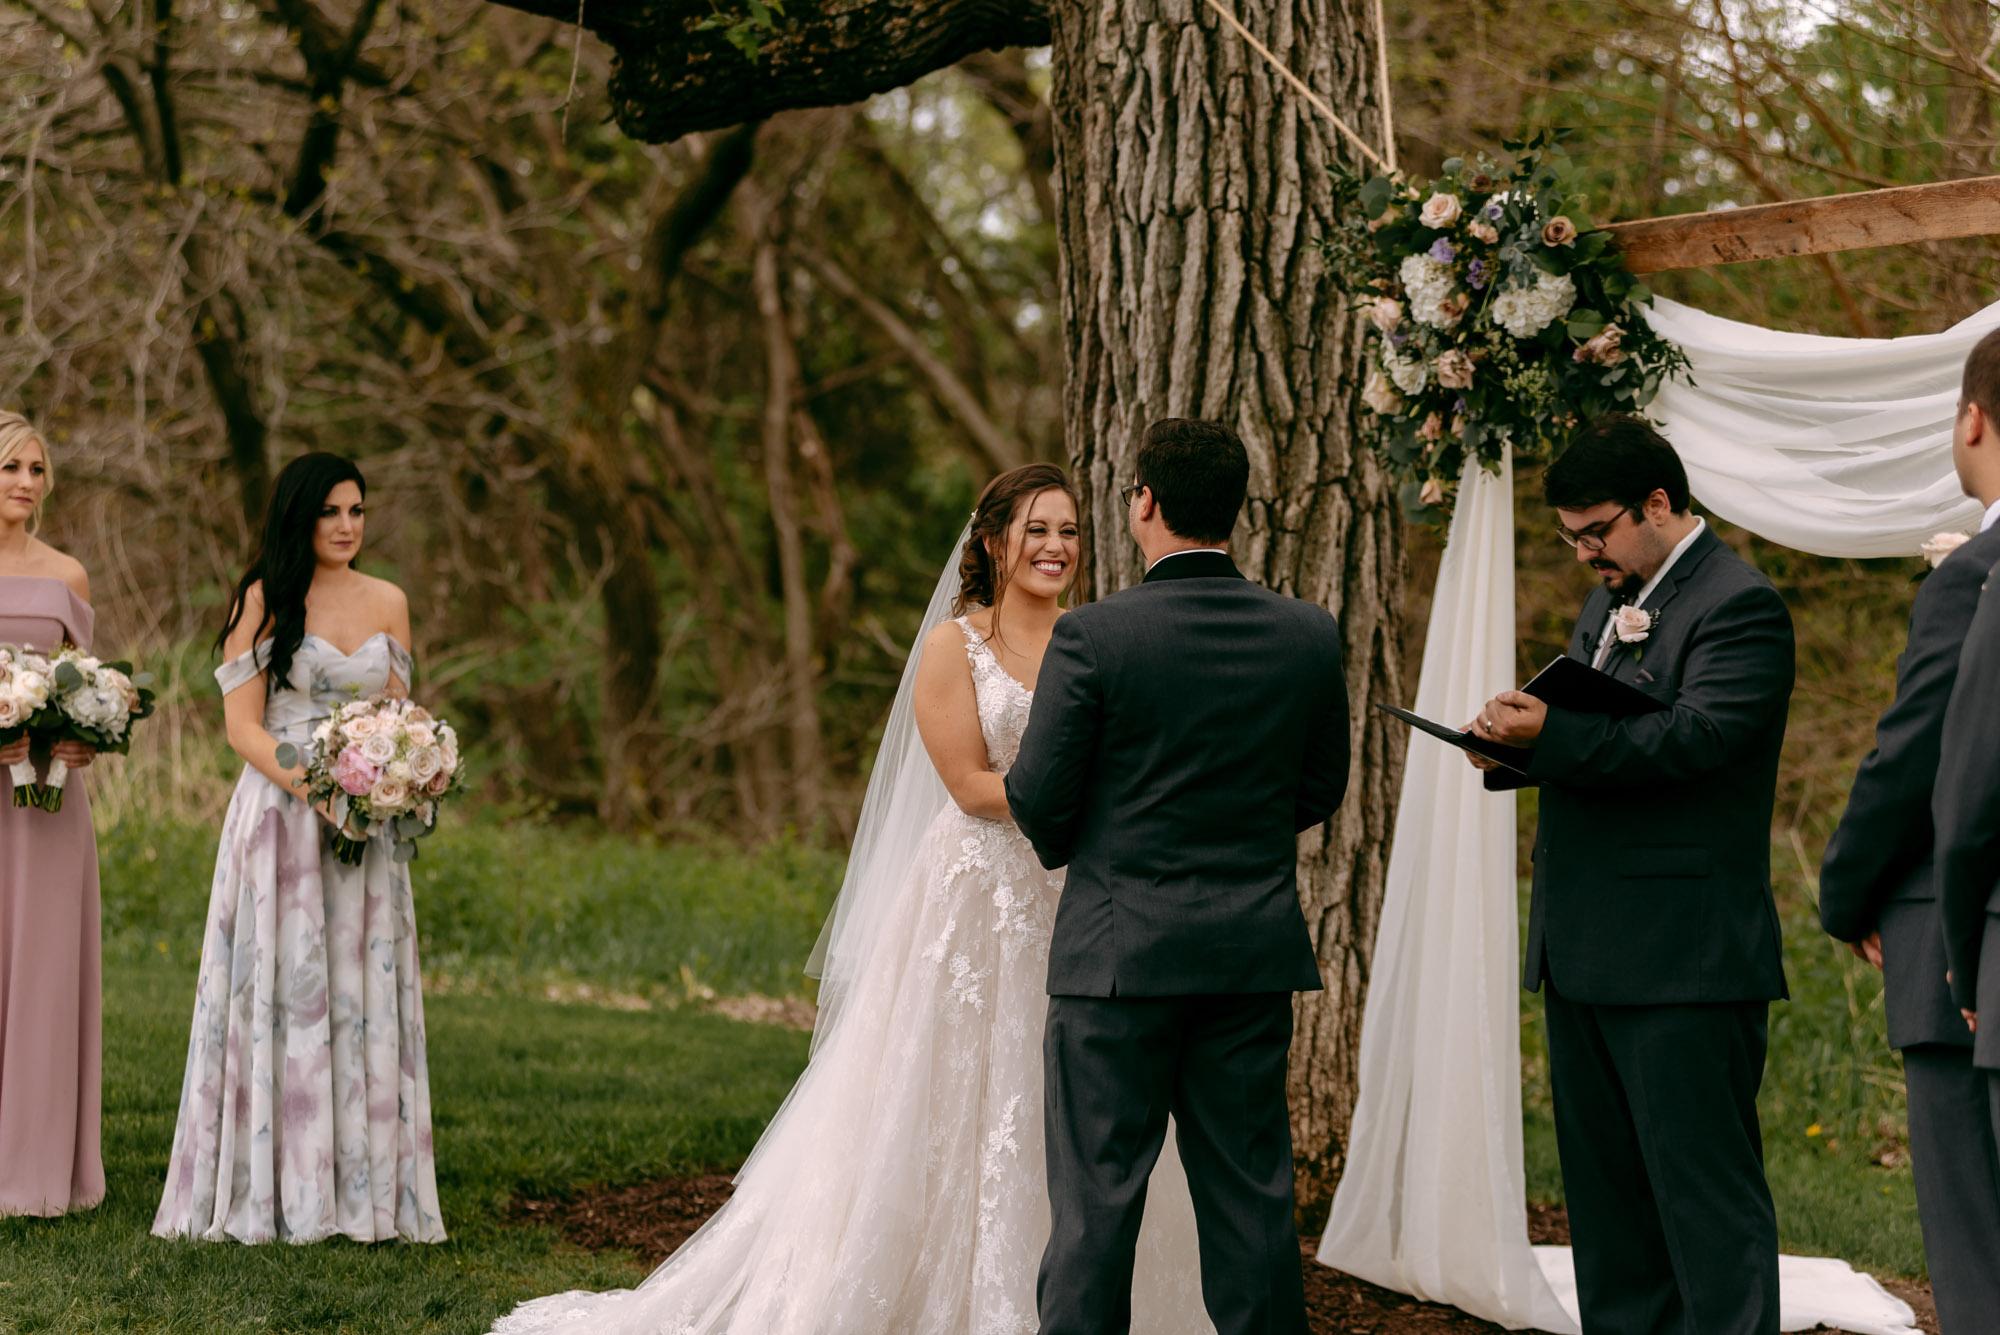 orchard-farms-pavillion-wedding-rockton-IL-wedding-photographers-279.jpg